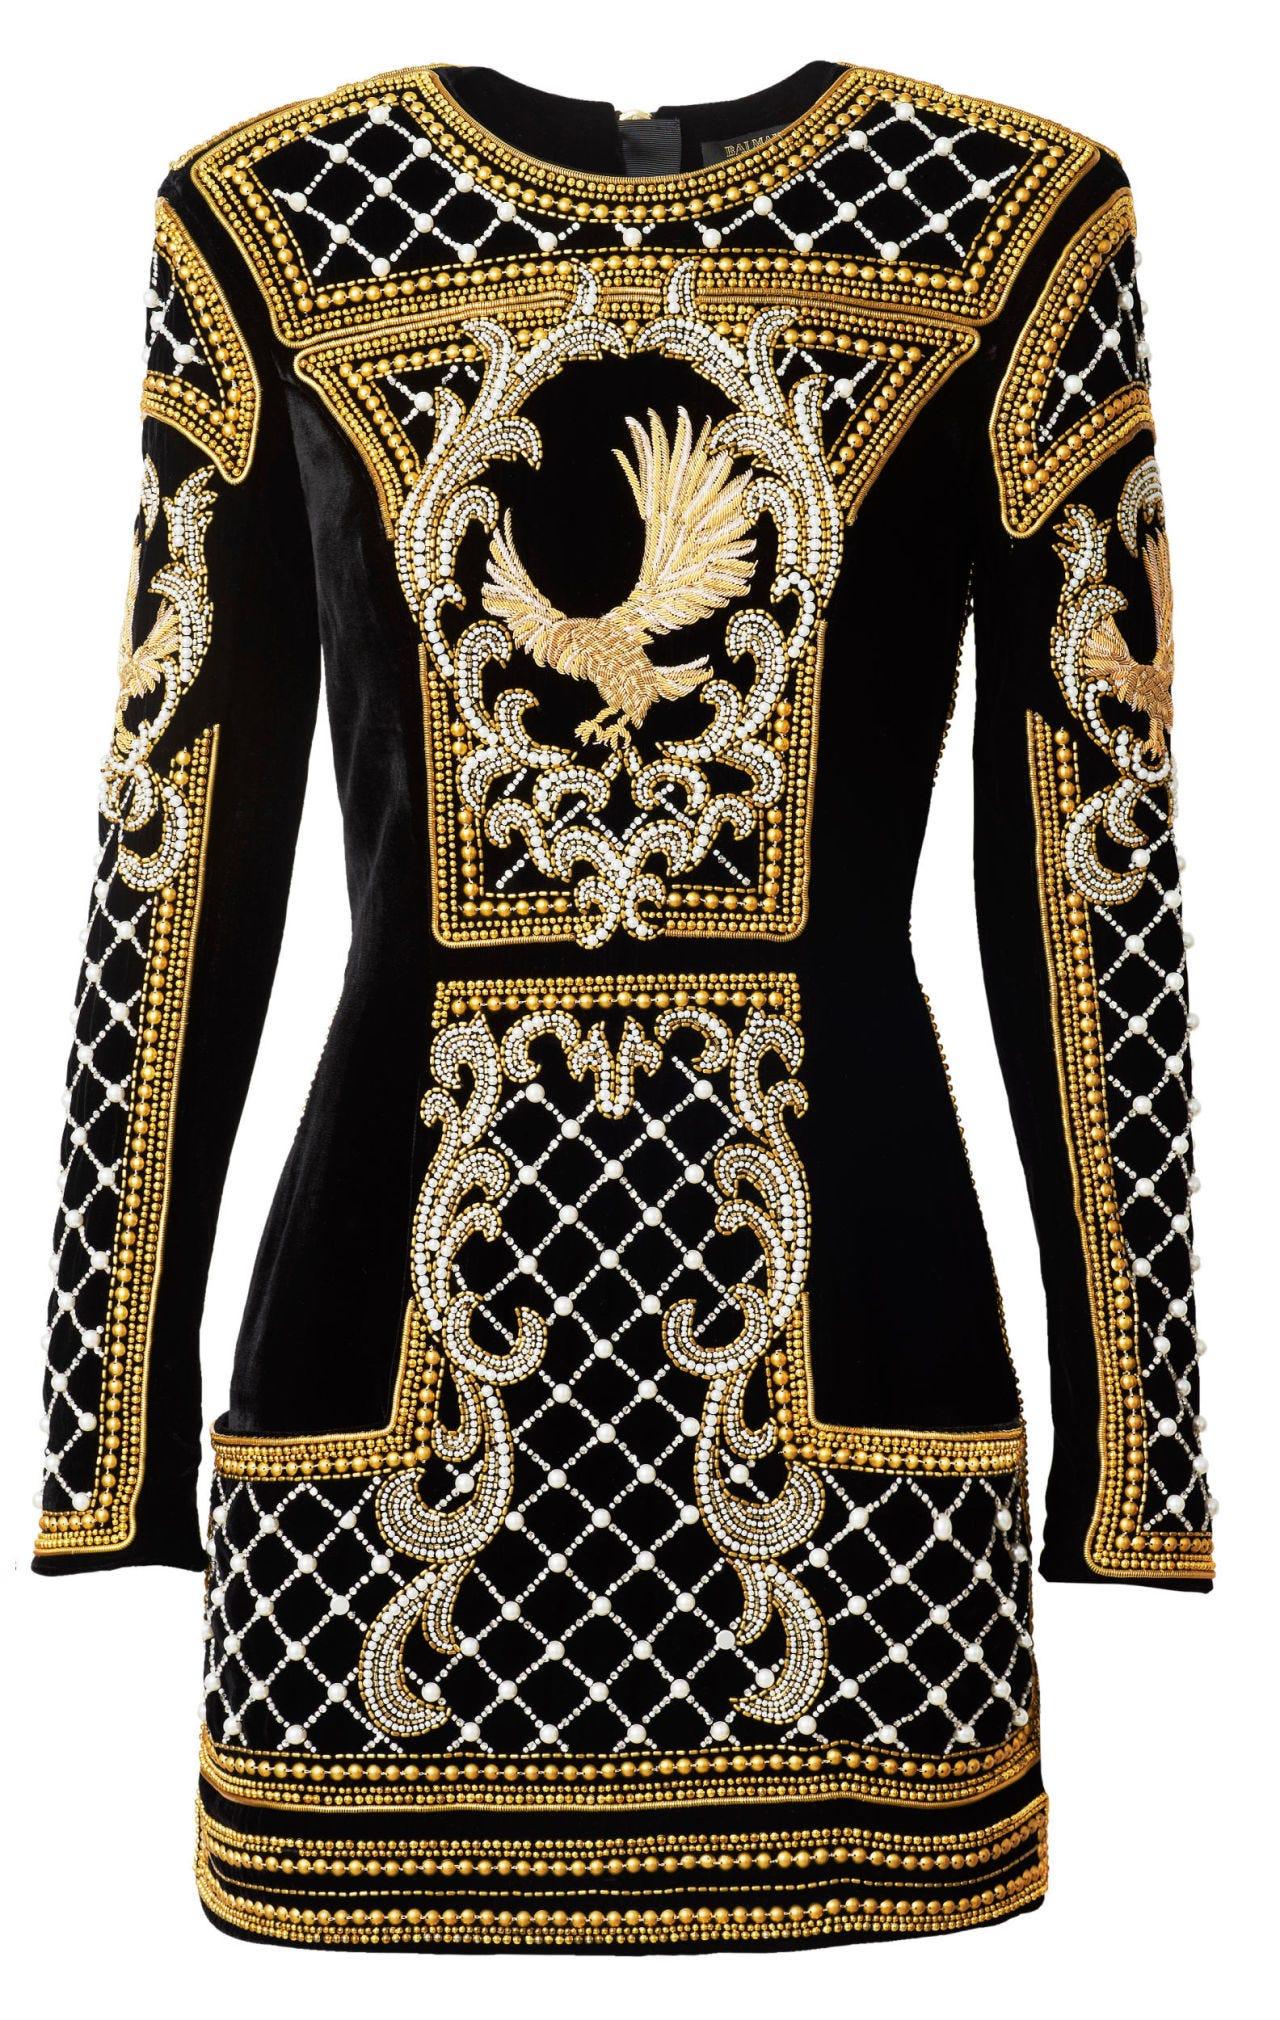 Brown, Yellow, Textile, Pattern, Style, Fashion, Black, Beige, Costume design, Visual arts,